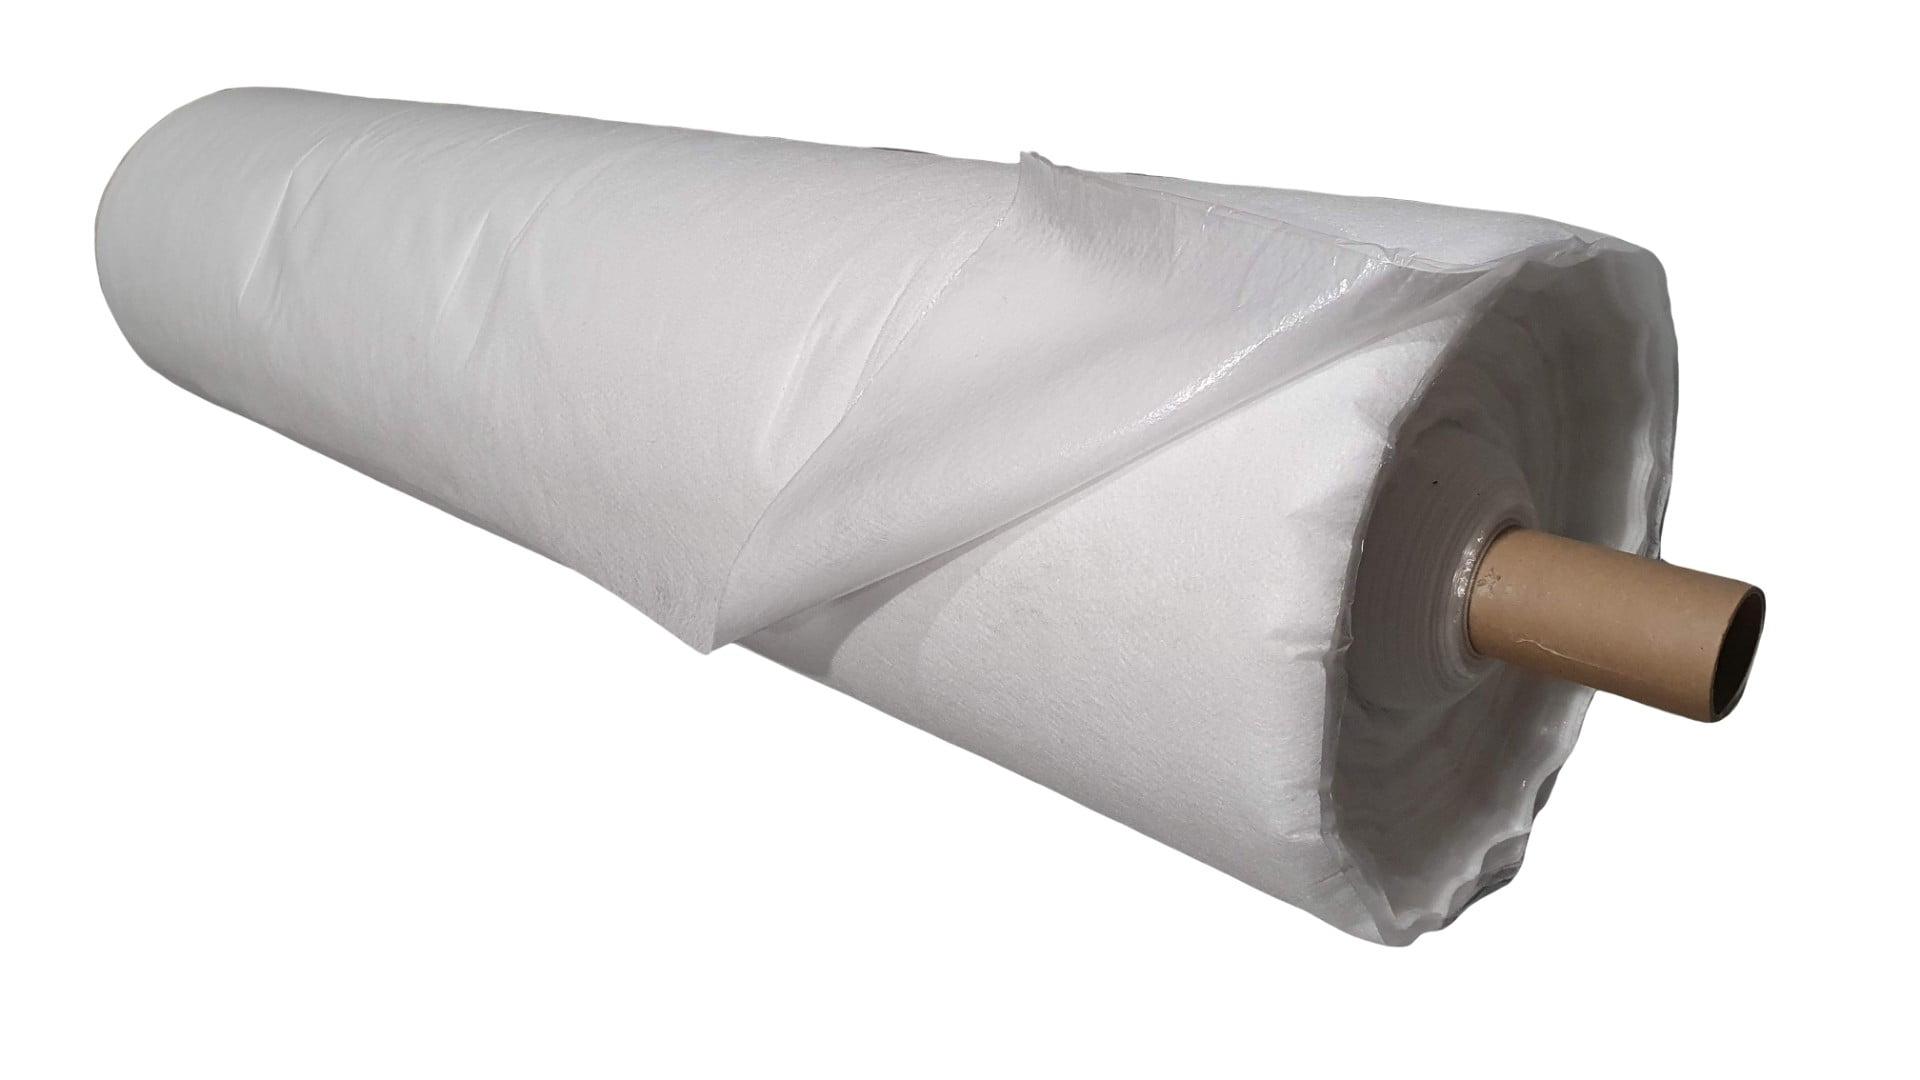 Geosin impermeabil, material laminat netesut polipropilena pentru articole medicale imagine 2021 somnart.ro